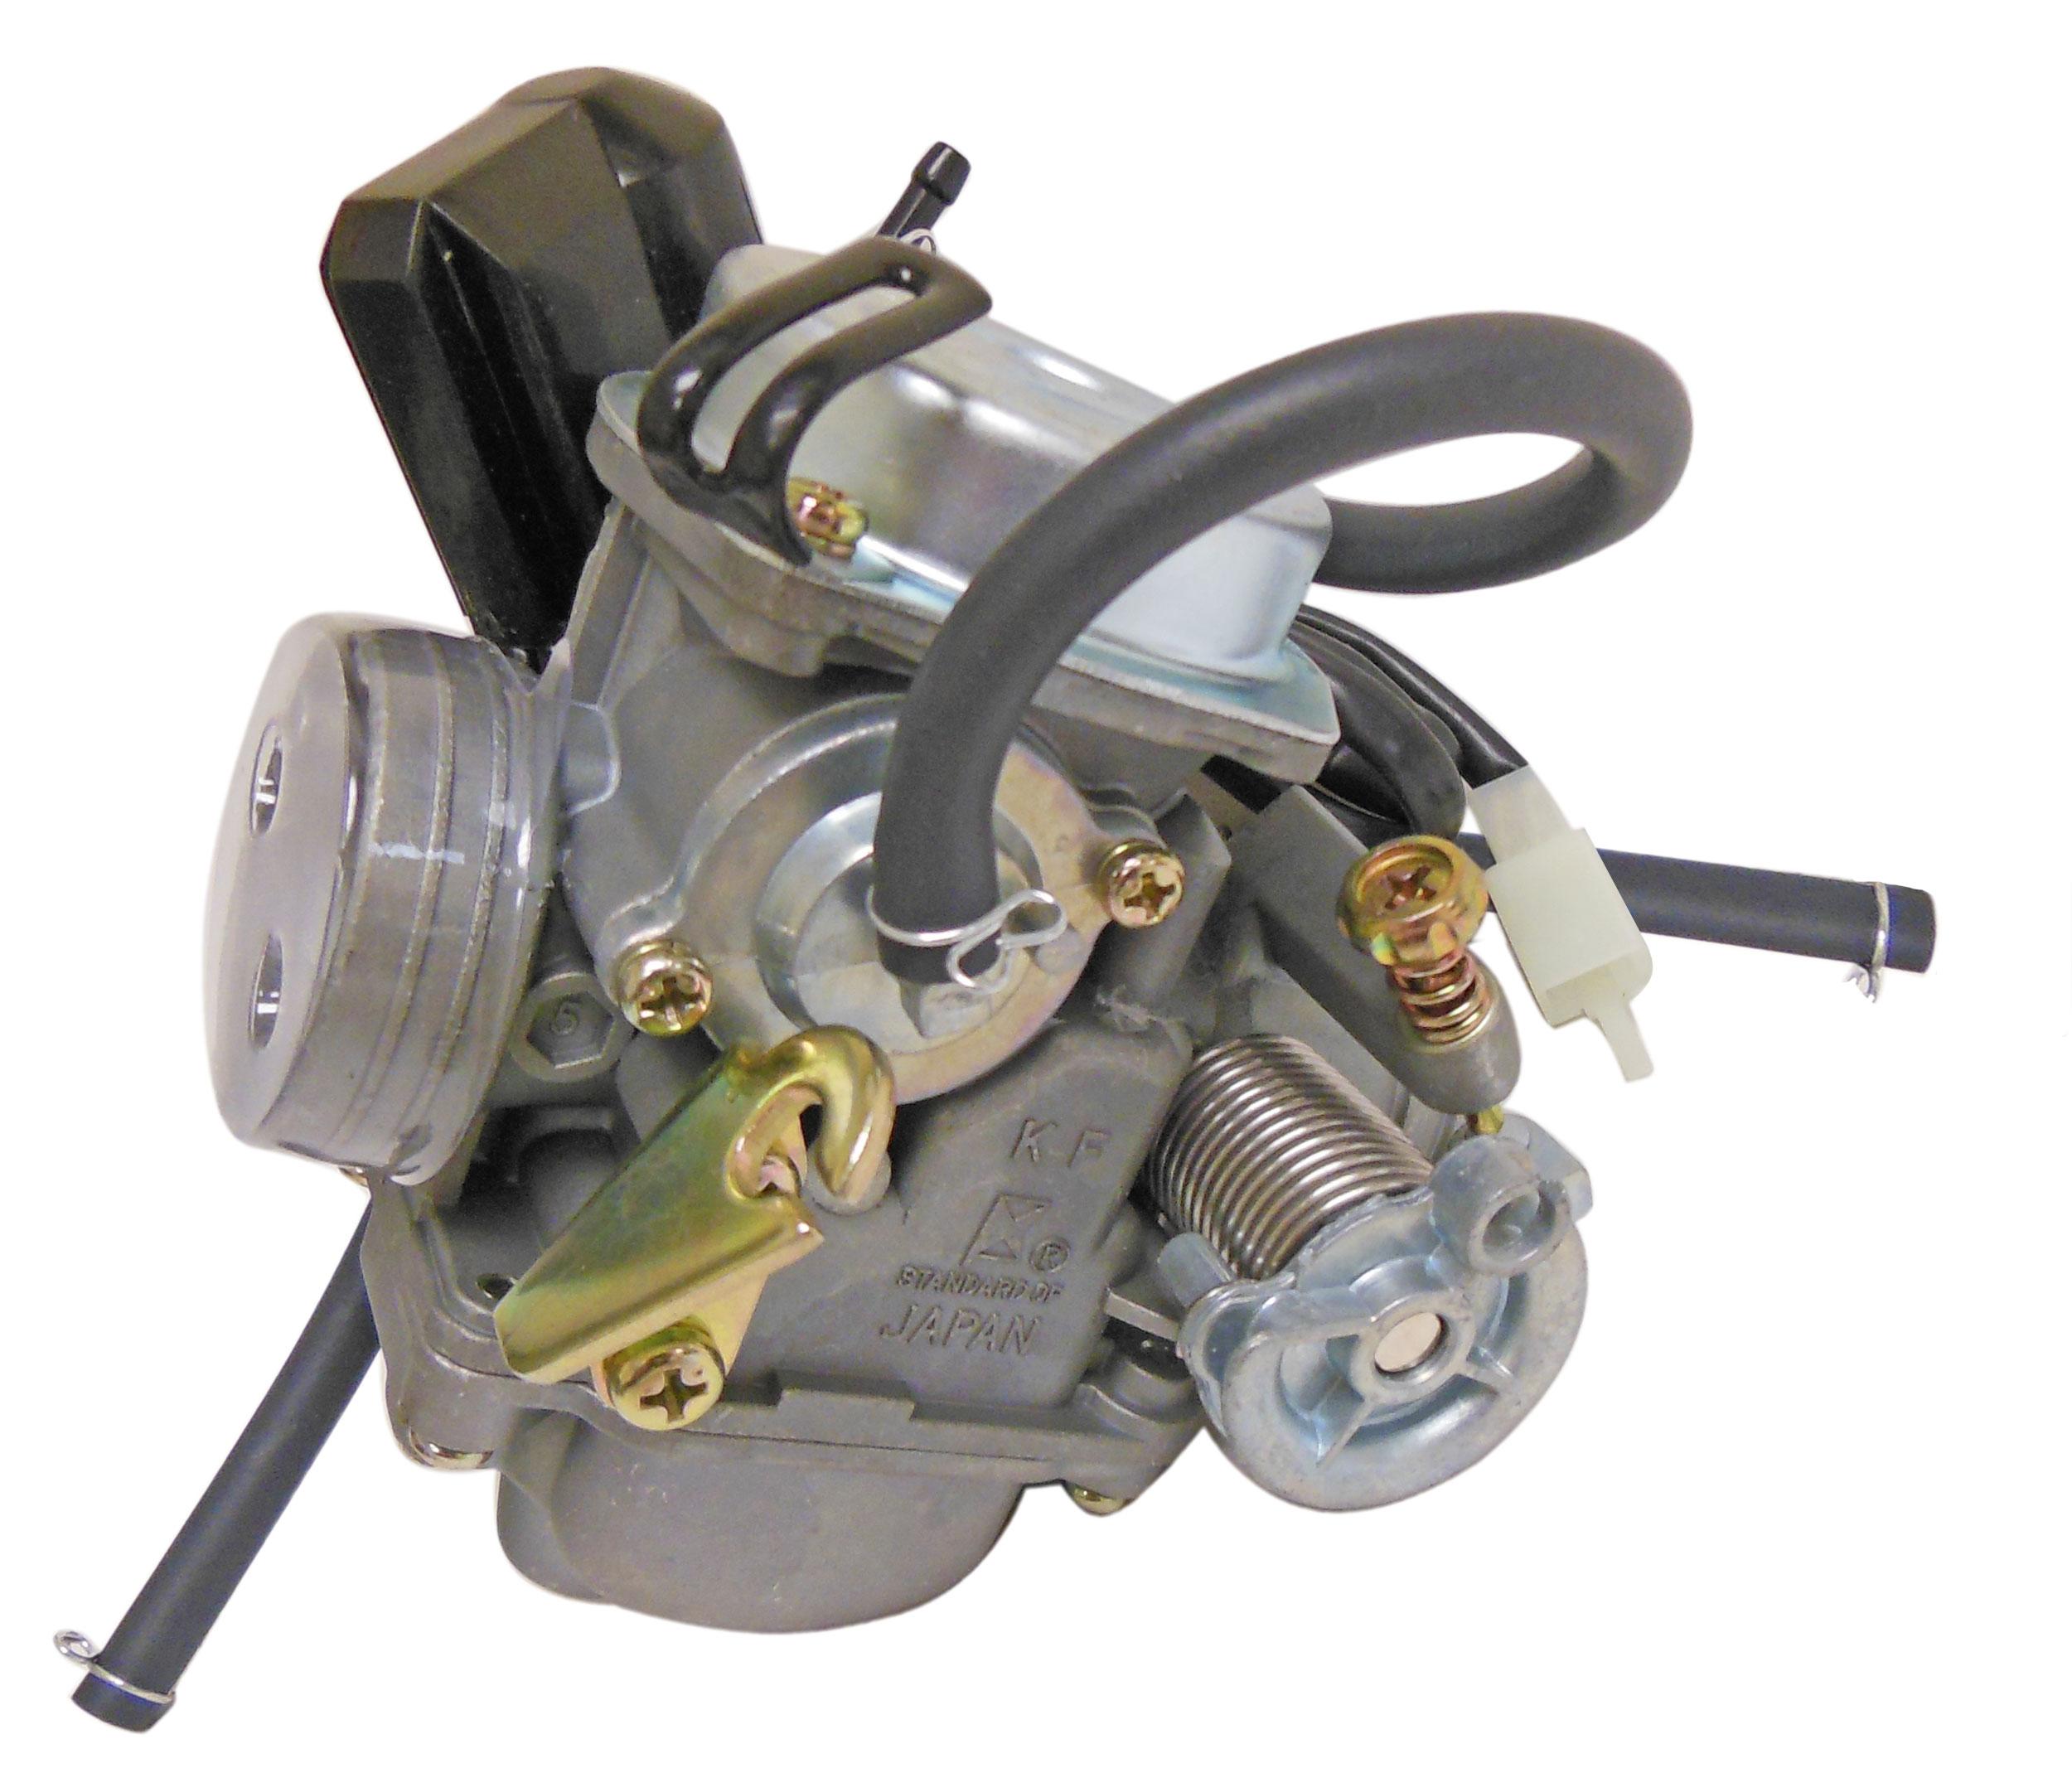 150cc Go Kart Carburetor for GY6 Engine | 501101 | BMI Karts And Parts